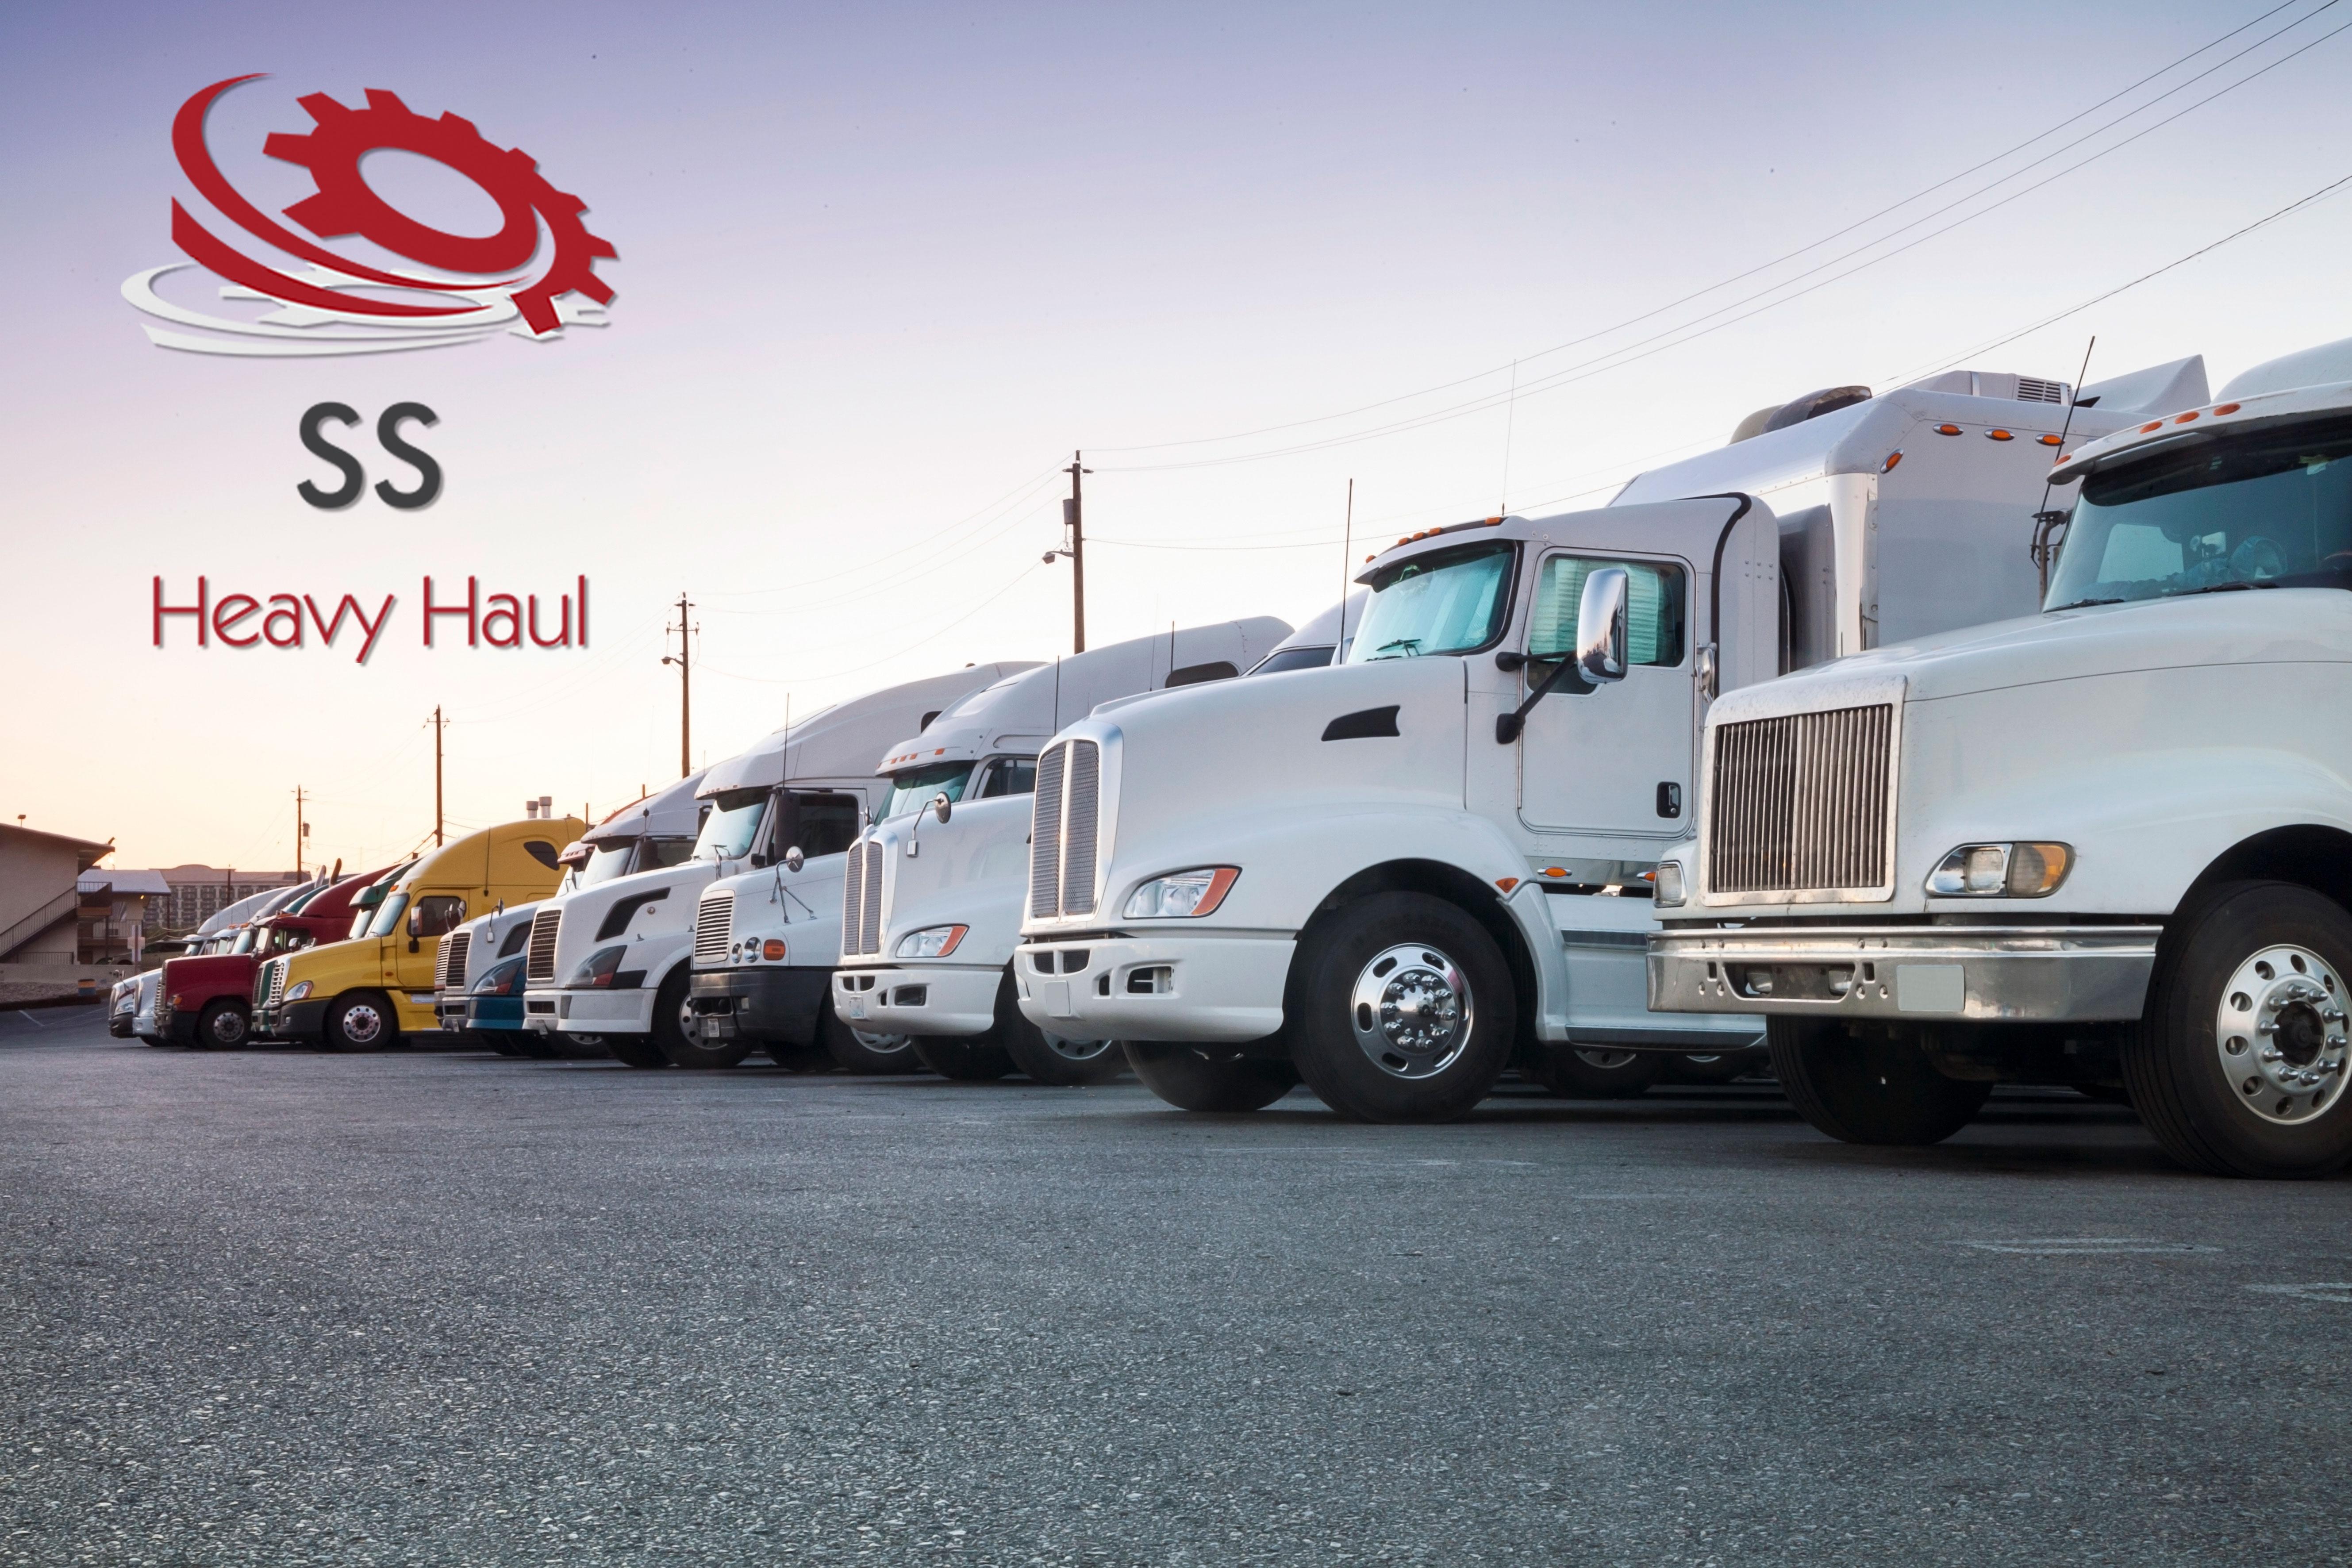 S&S Heavy Haul: Late-Model Tractor Truck and Tank Trailer Fleet